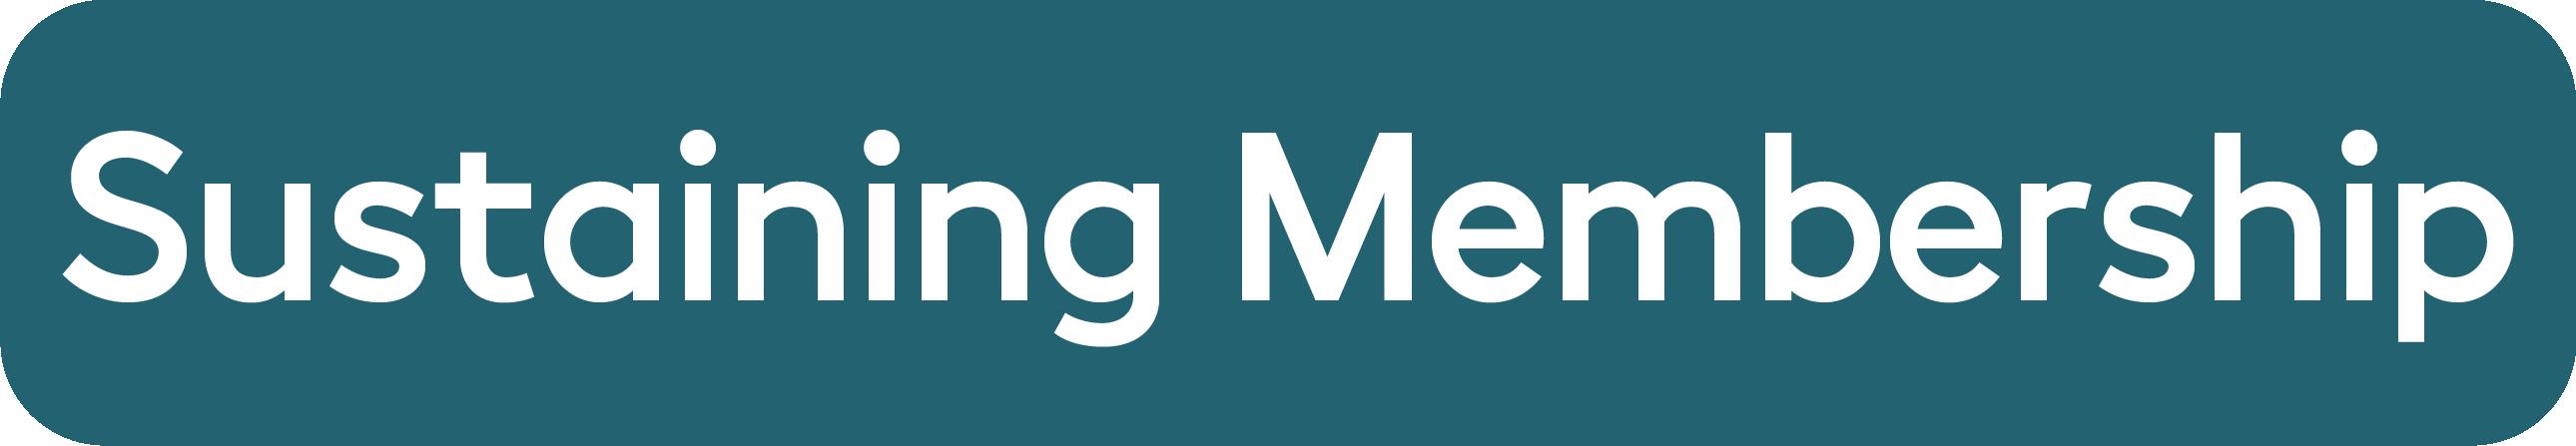 sustaining_member-01.png